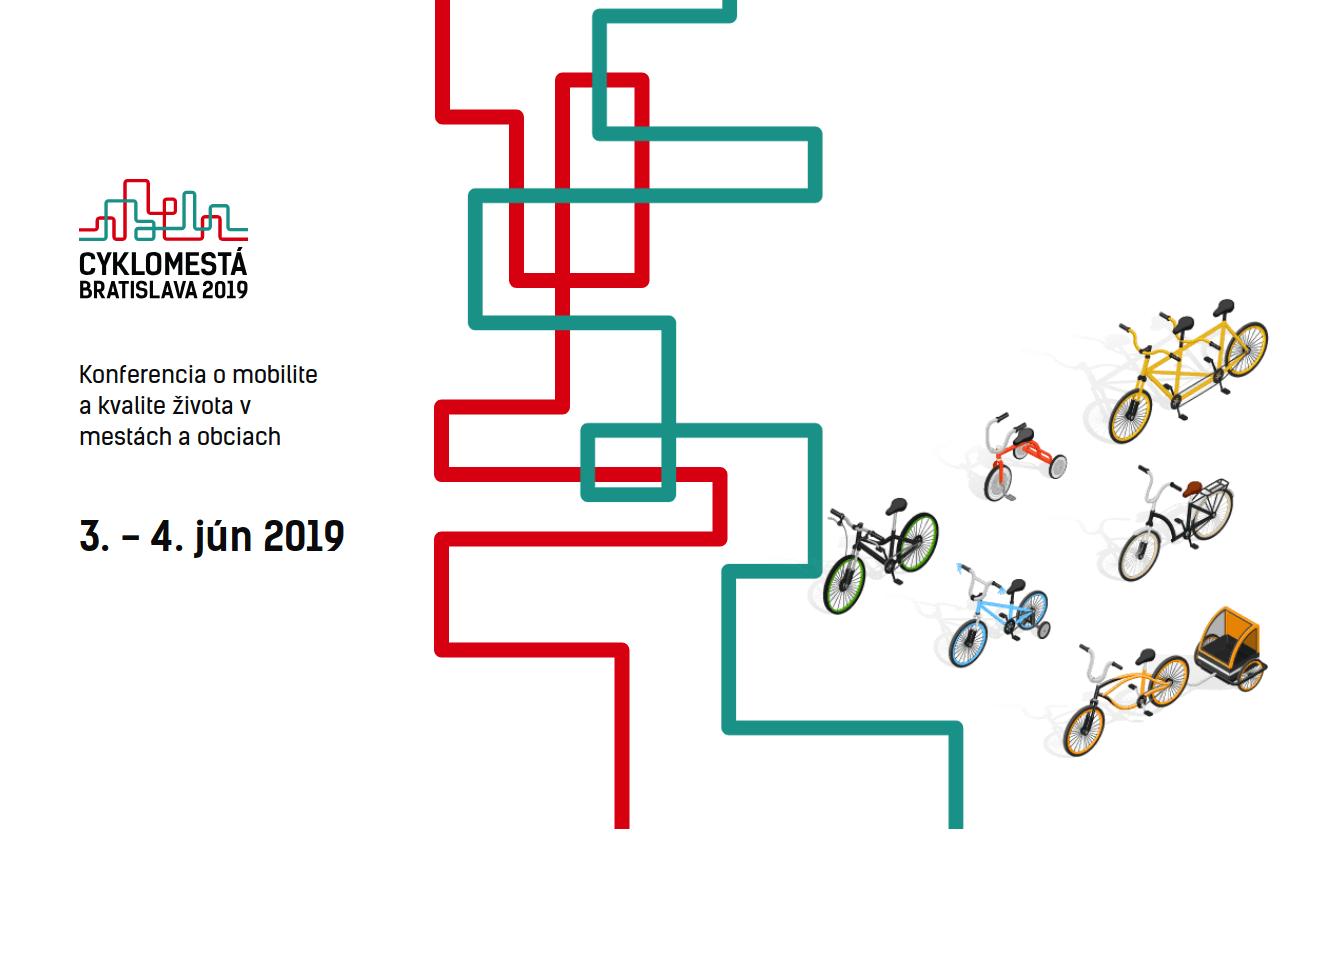 Konferencia Cyklomestá